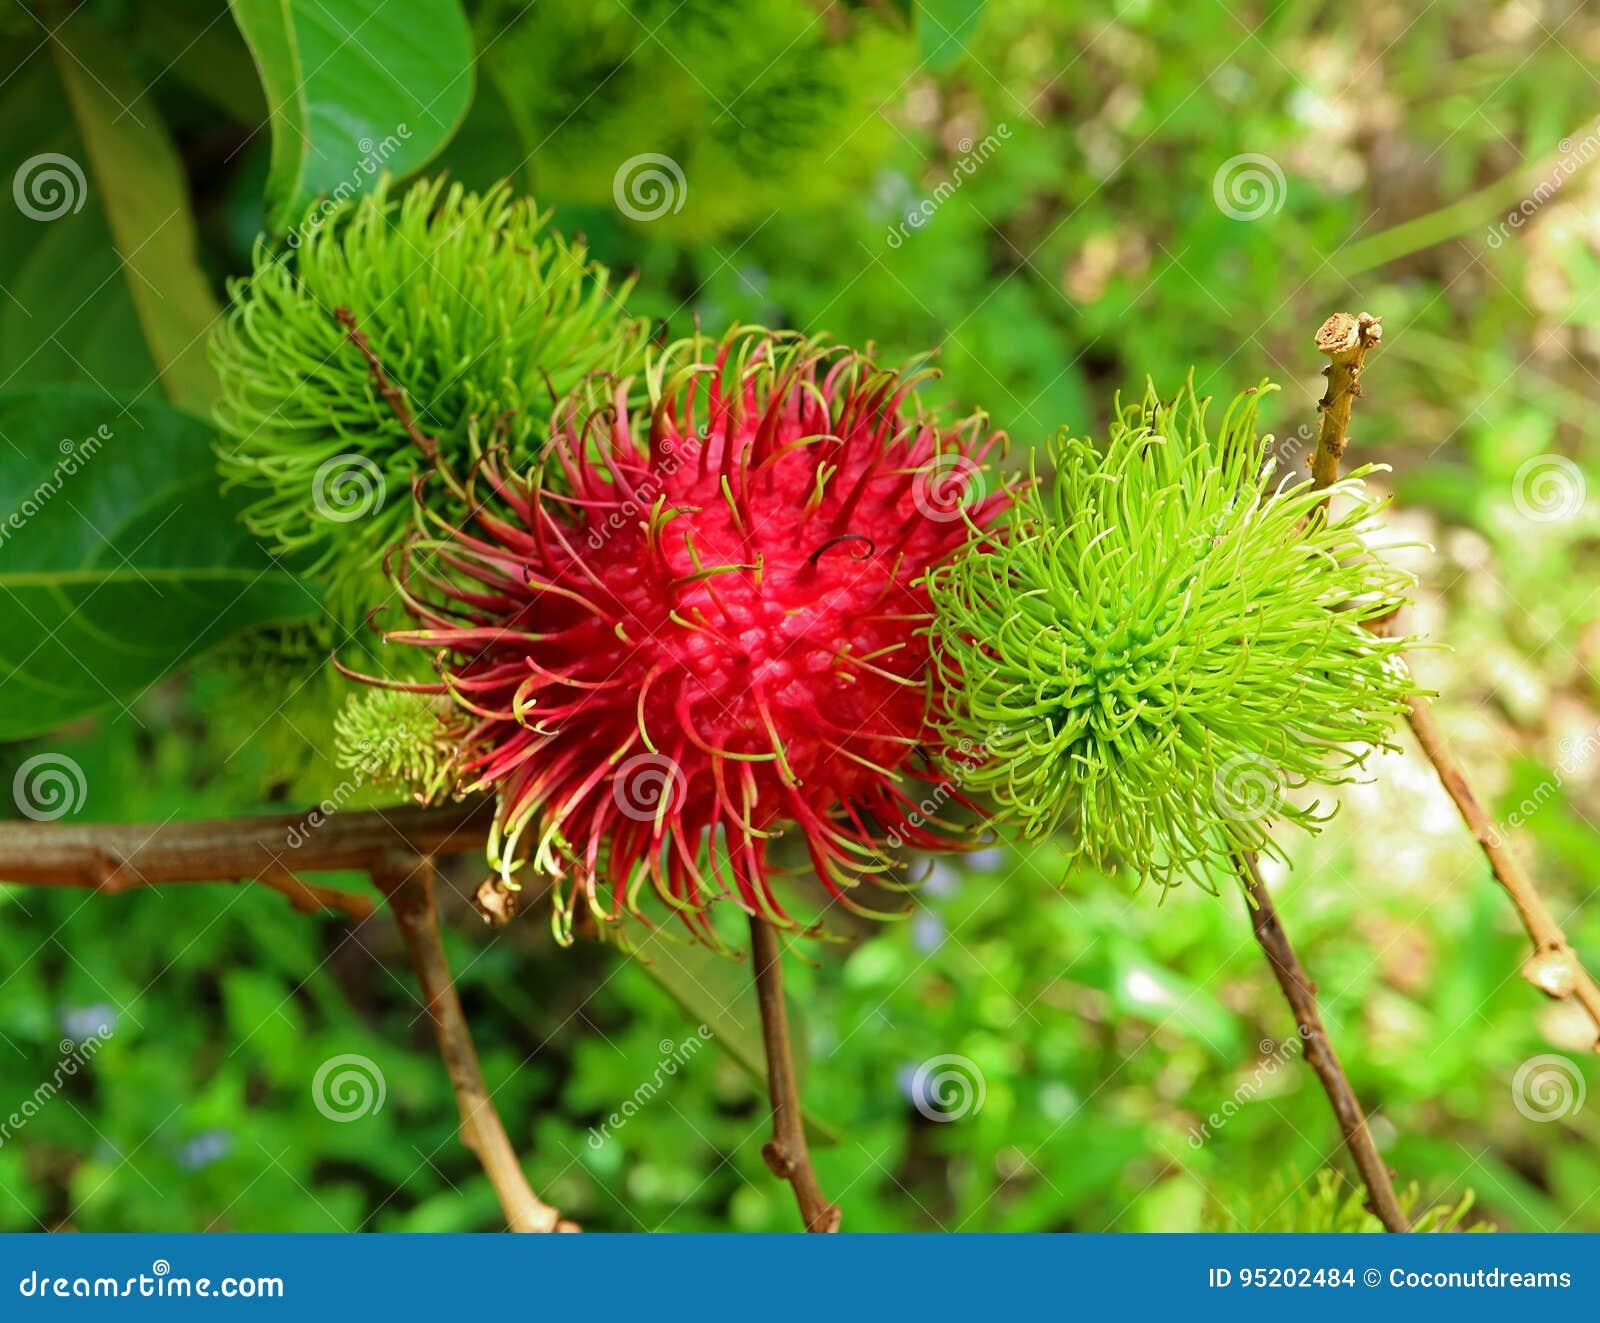 Vibrant Red Color Ripe Rambutan Fruit Amongst The Unripe On The Tree ...